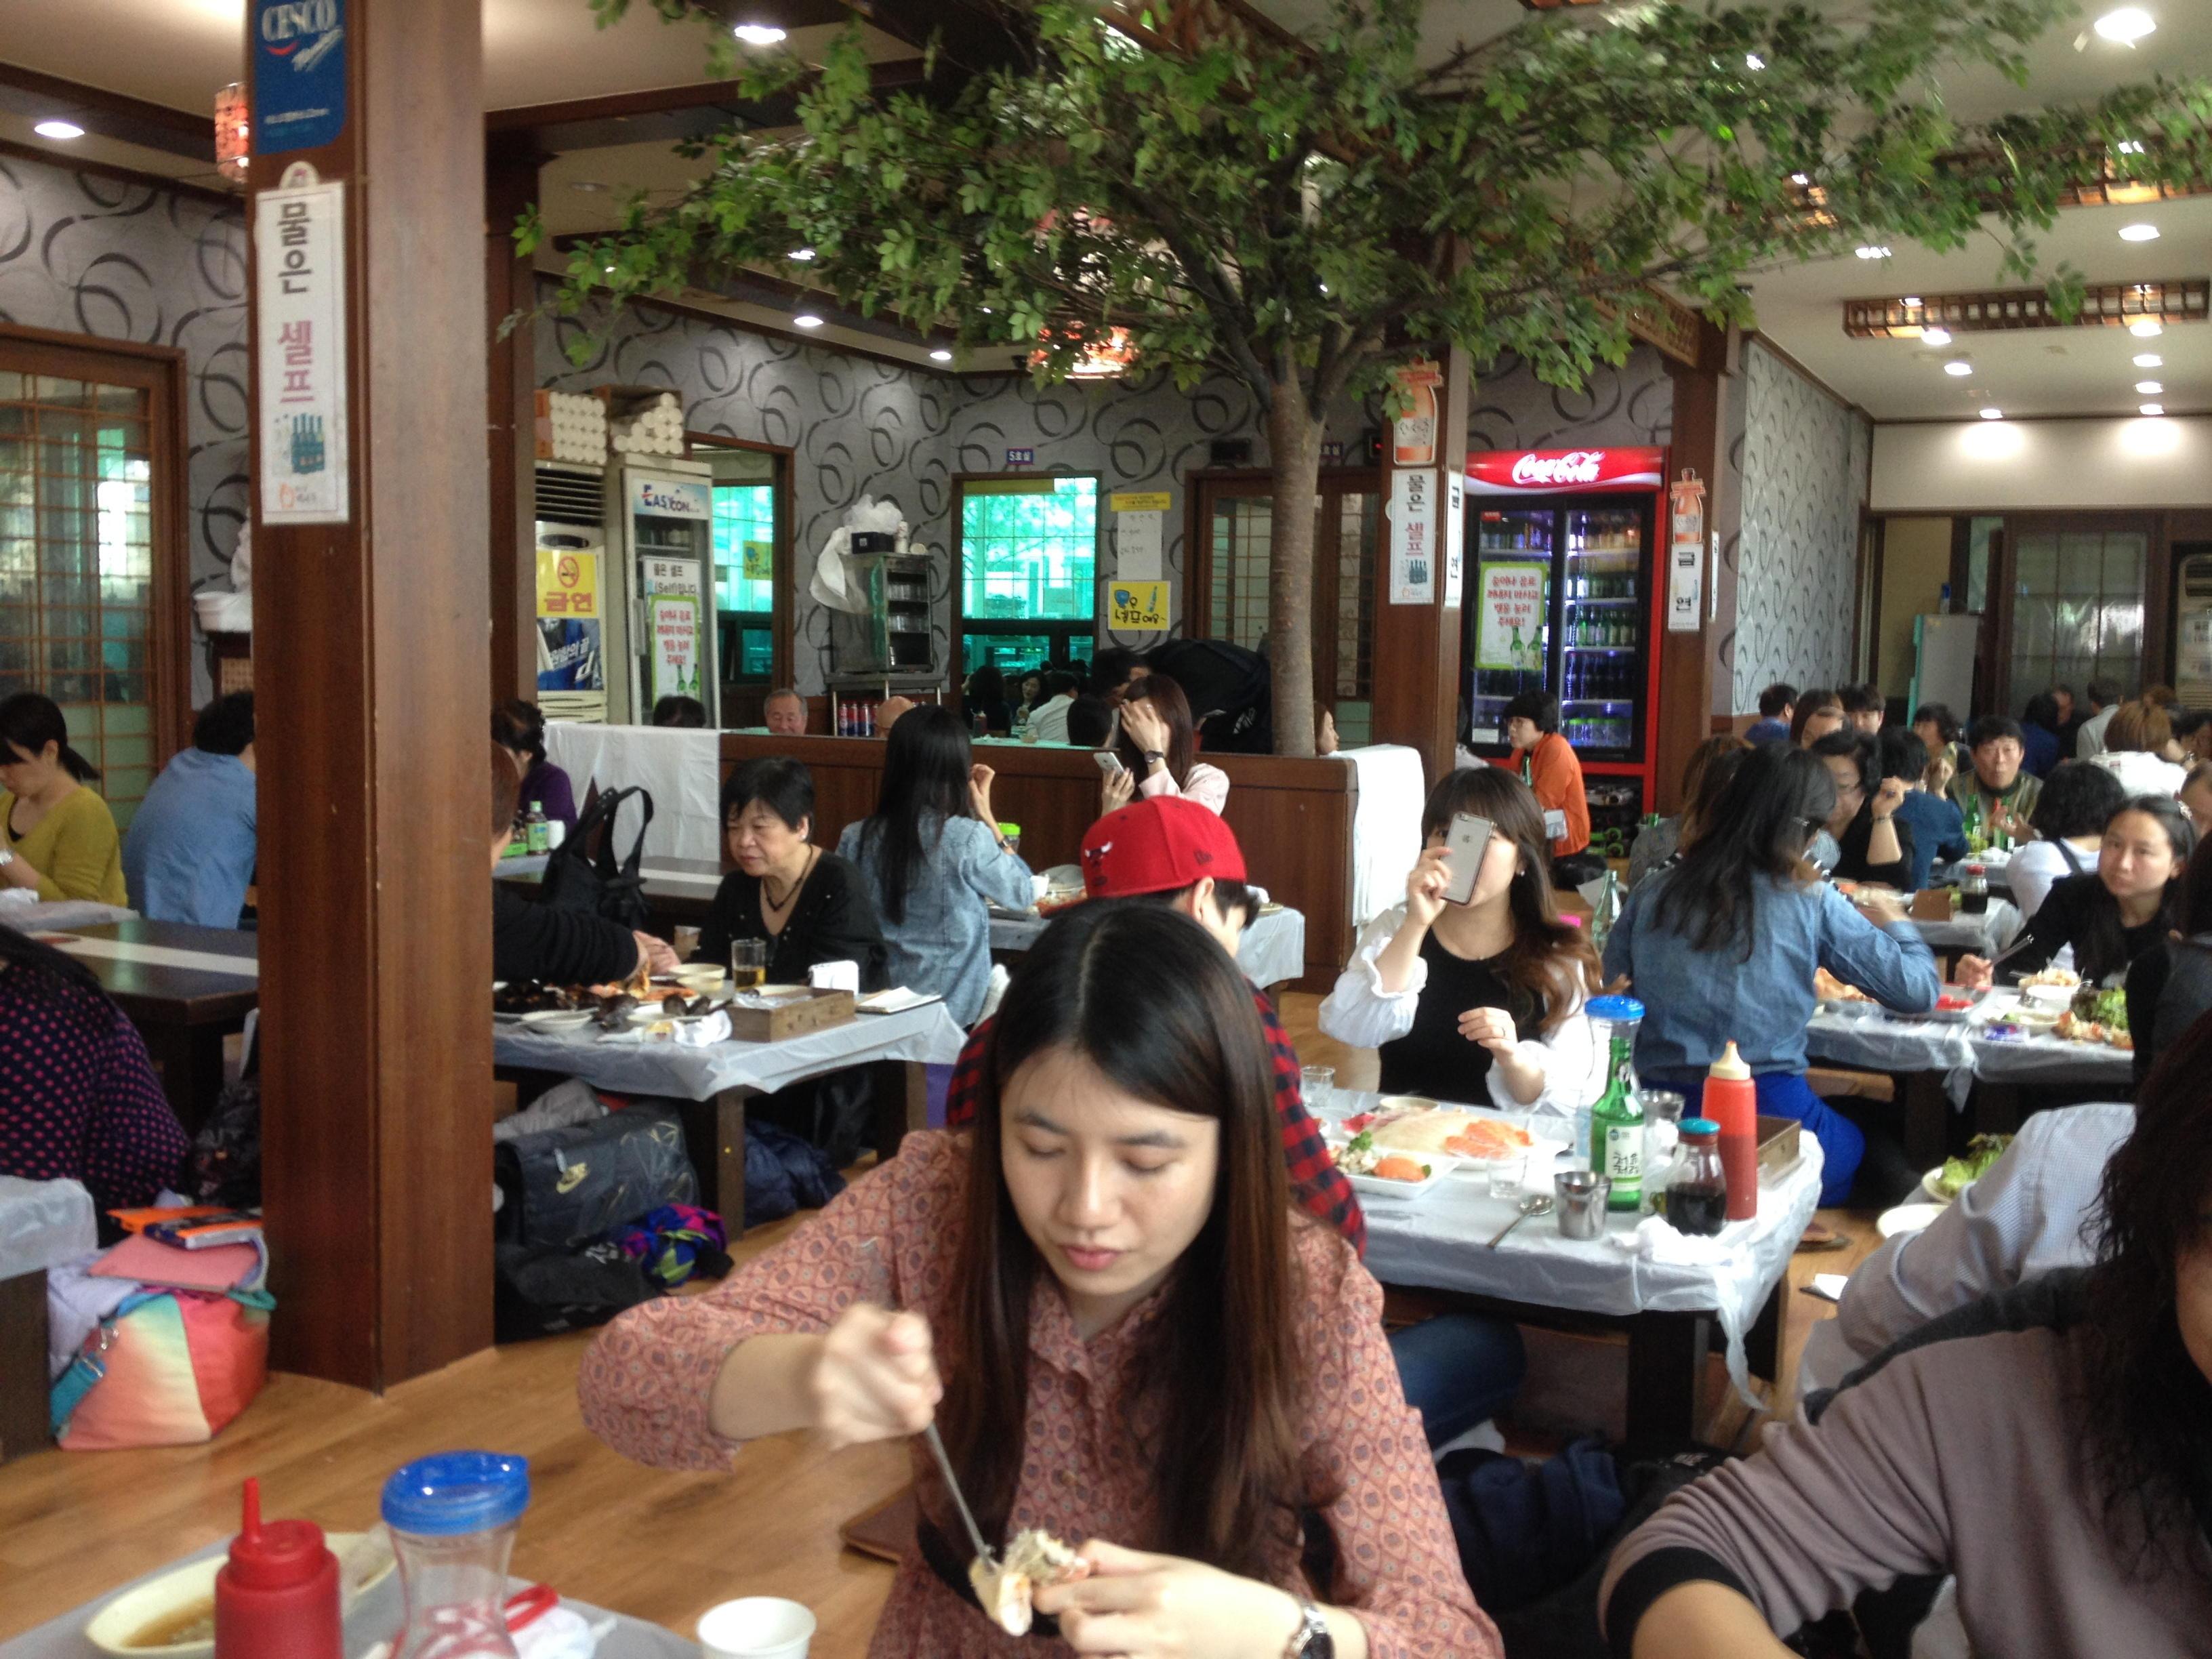 2015-04-18 Noryangjin Fish Mkt 068